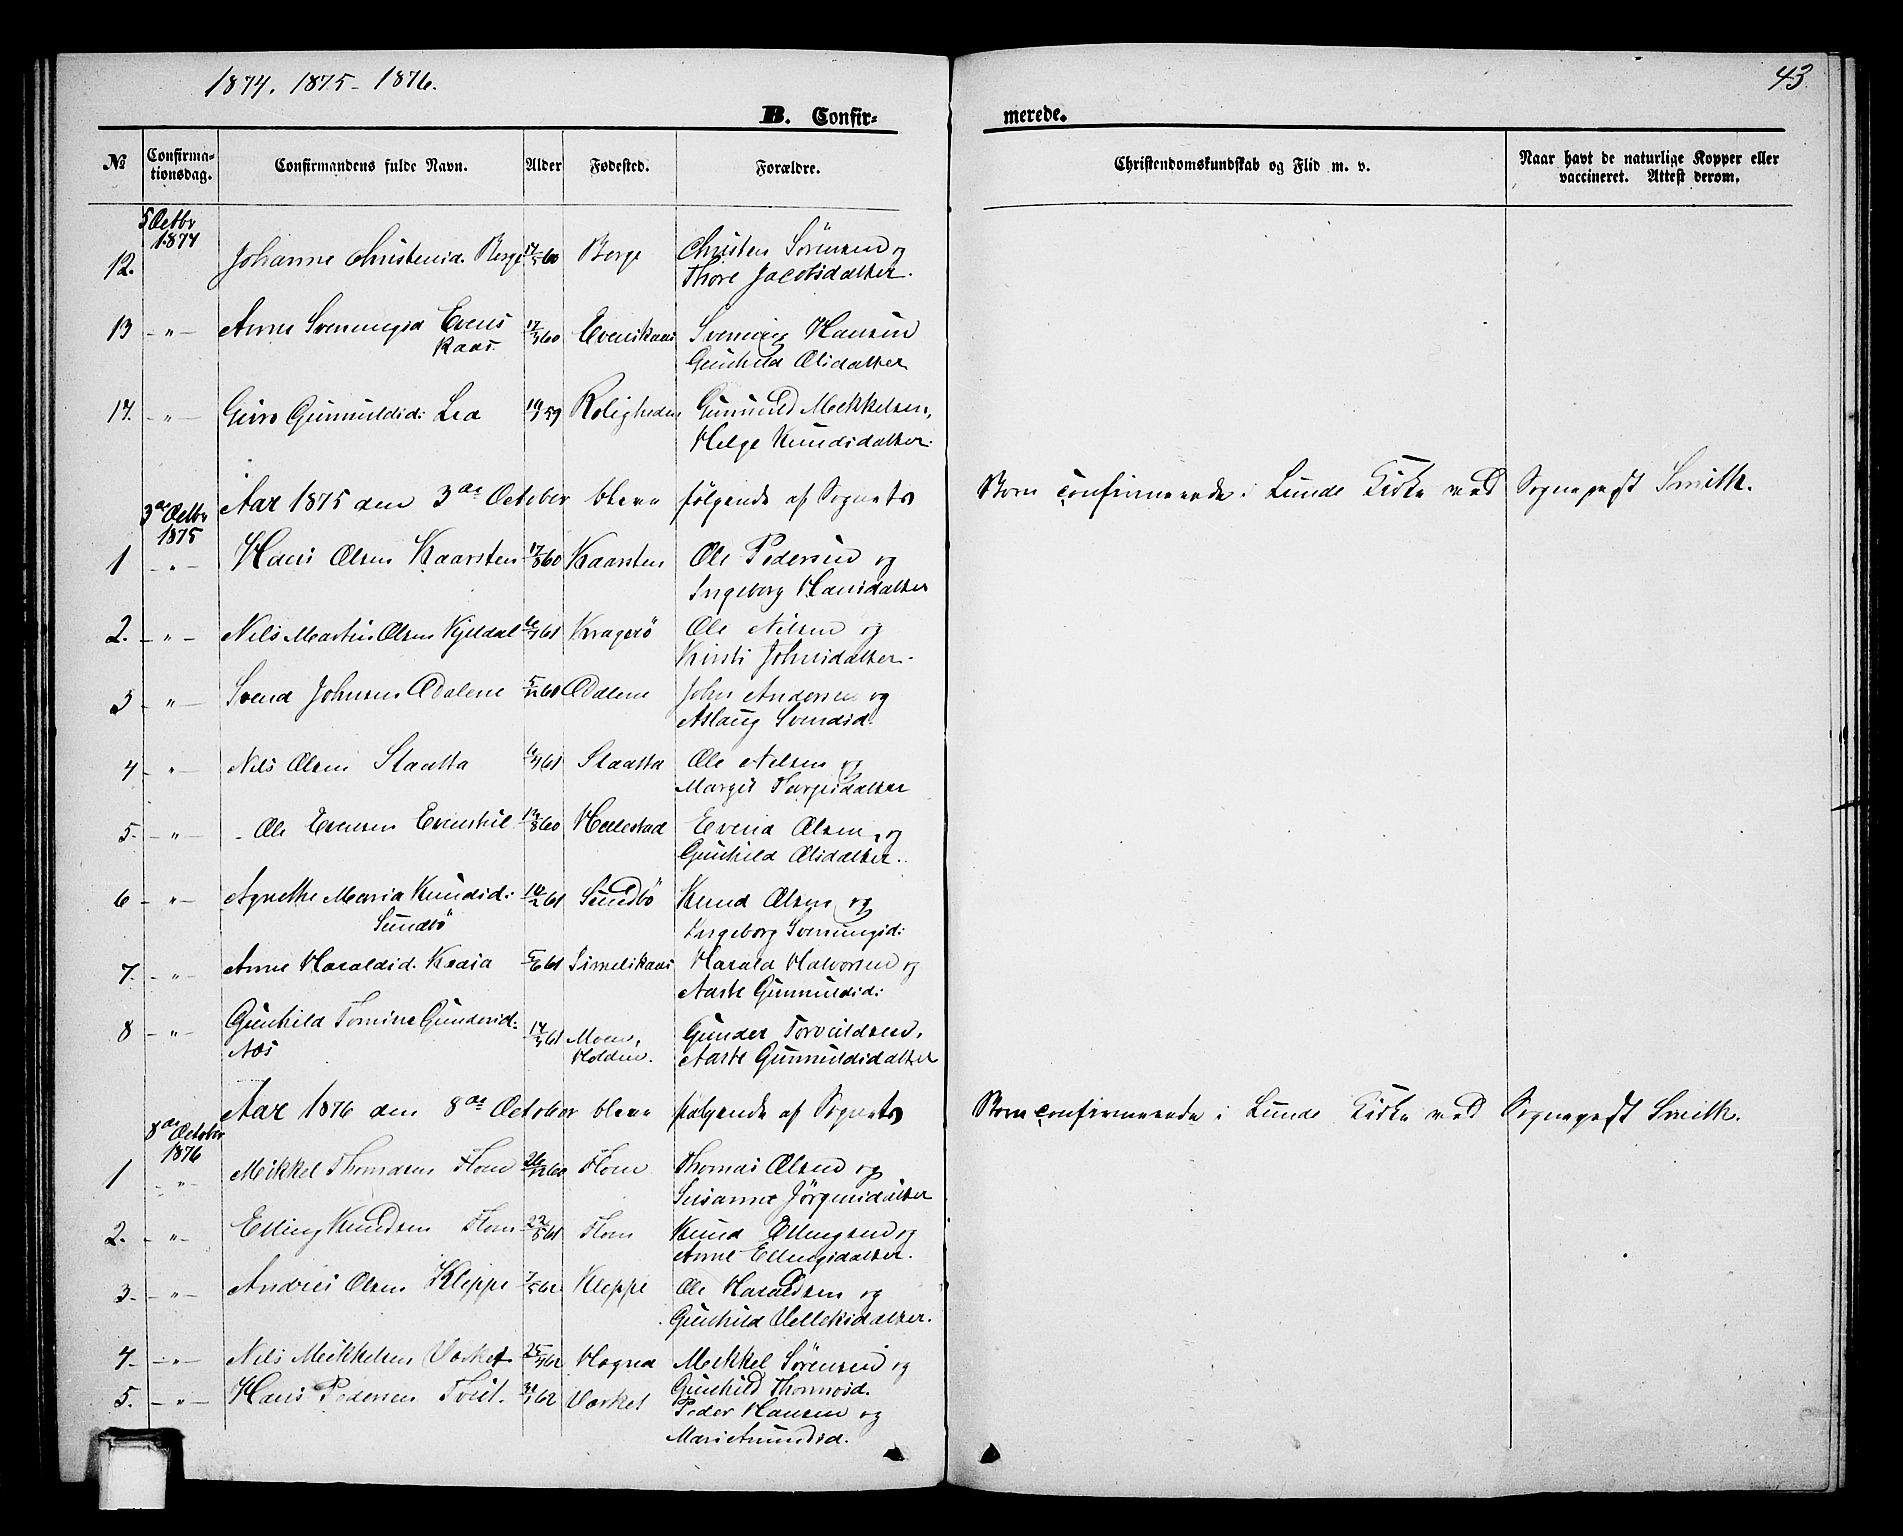 SAKO, Lunde kirkebøker, G/Gb/L0001: Klokkerbok nr. II 1, 1866-1887, s. 43